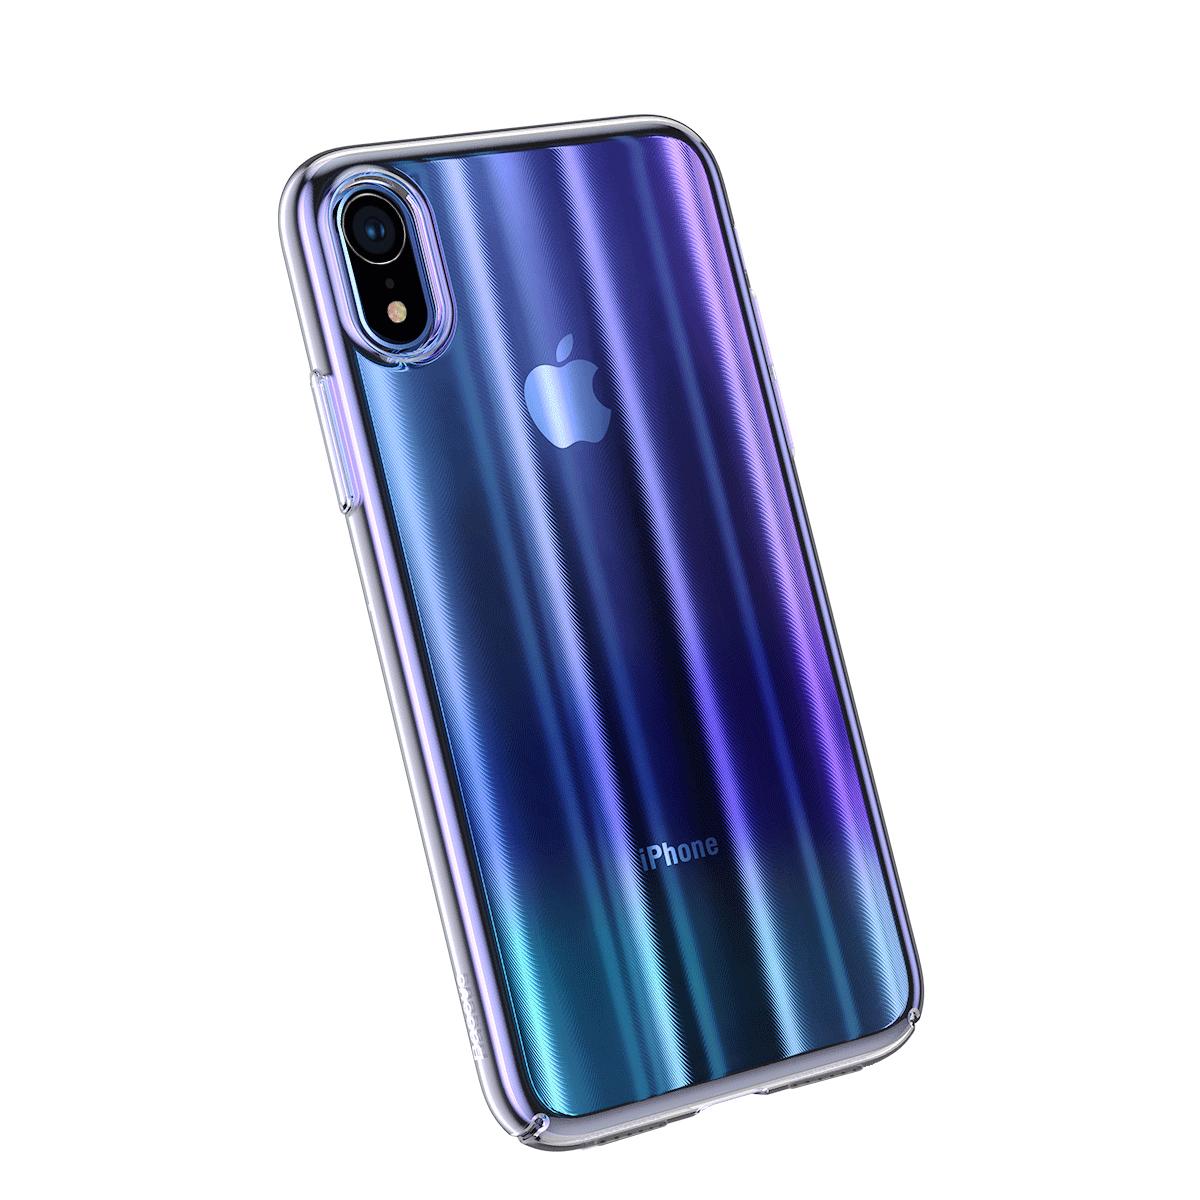 Baseus WIAPIPH65-JG03 Gradient Aurora Hard Plastic Case Apple iPhone X -  Blue